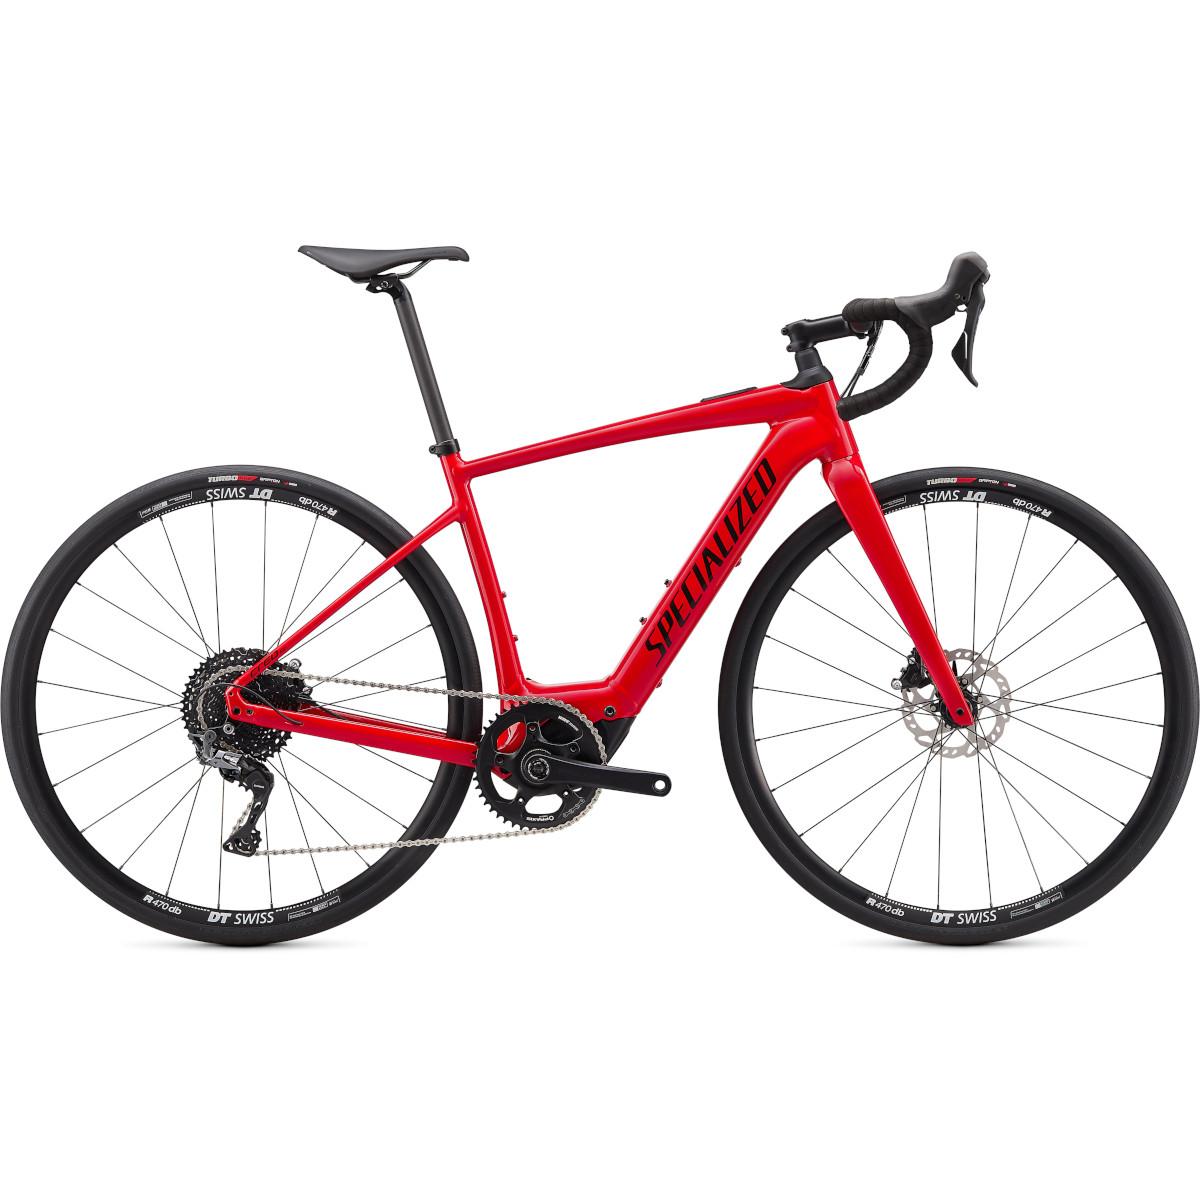 Produktbild von Specialized TURBO CREO SL COMP E5 - Gravel E-Bike - 2022 - flo red / black